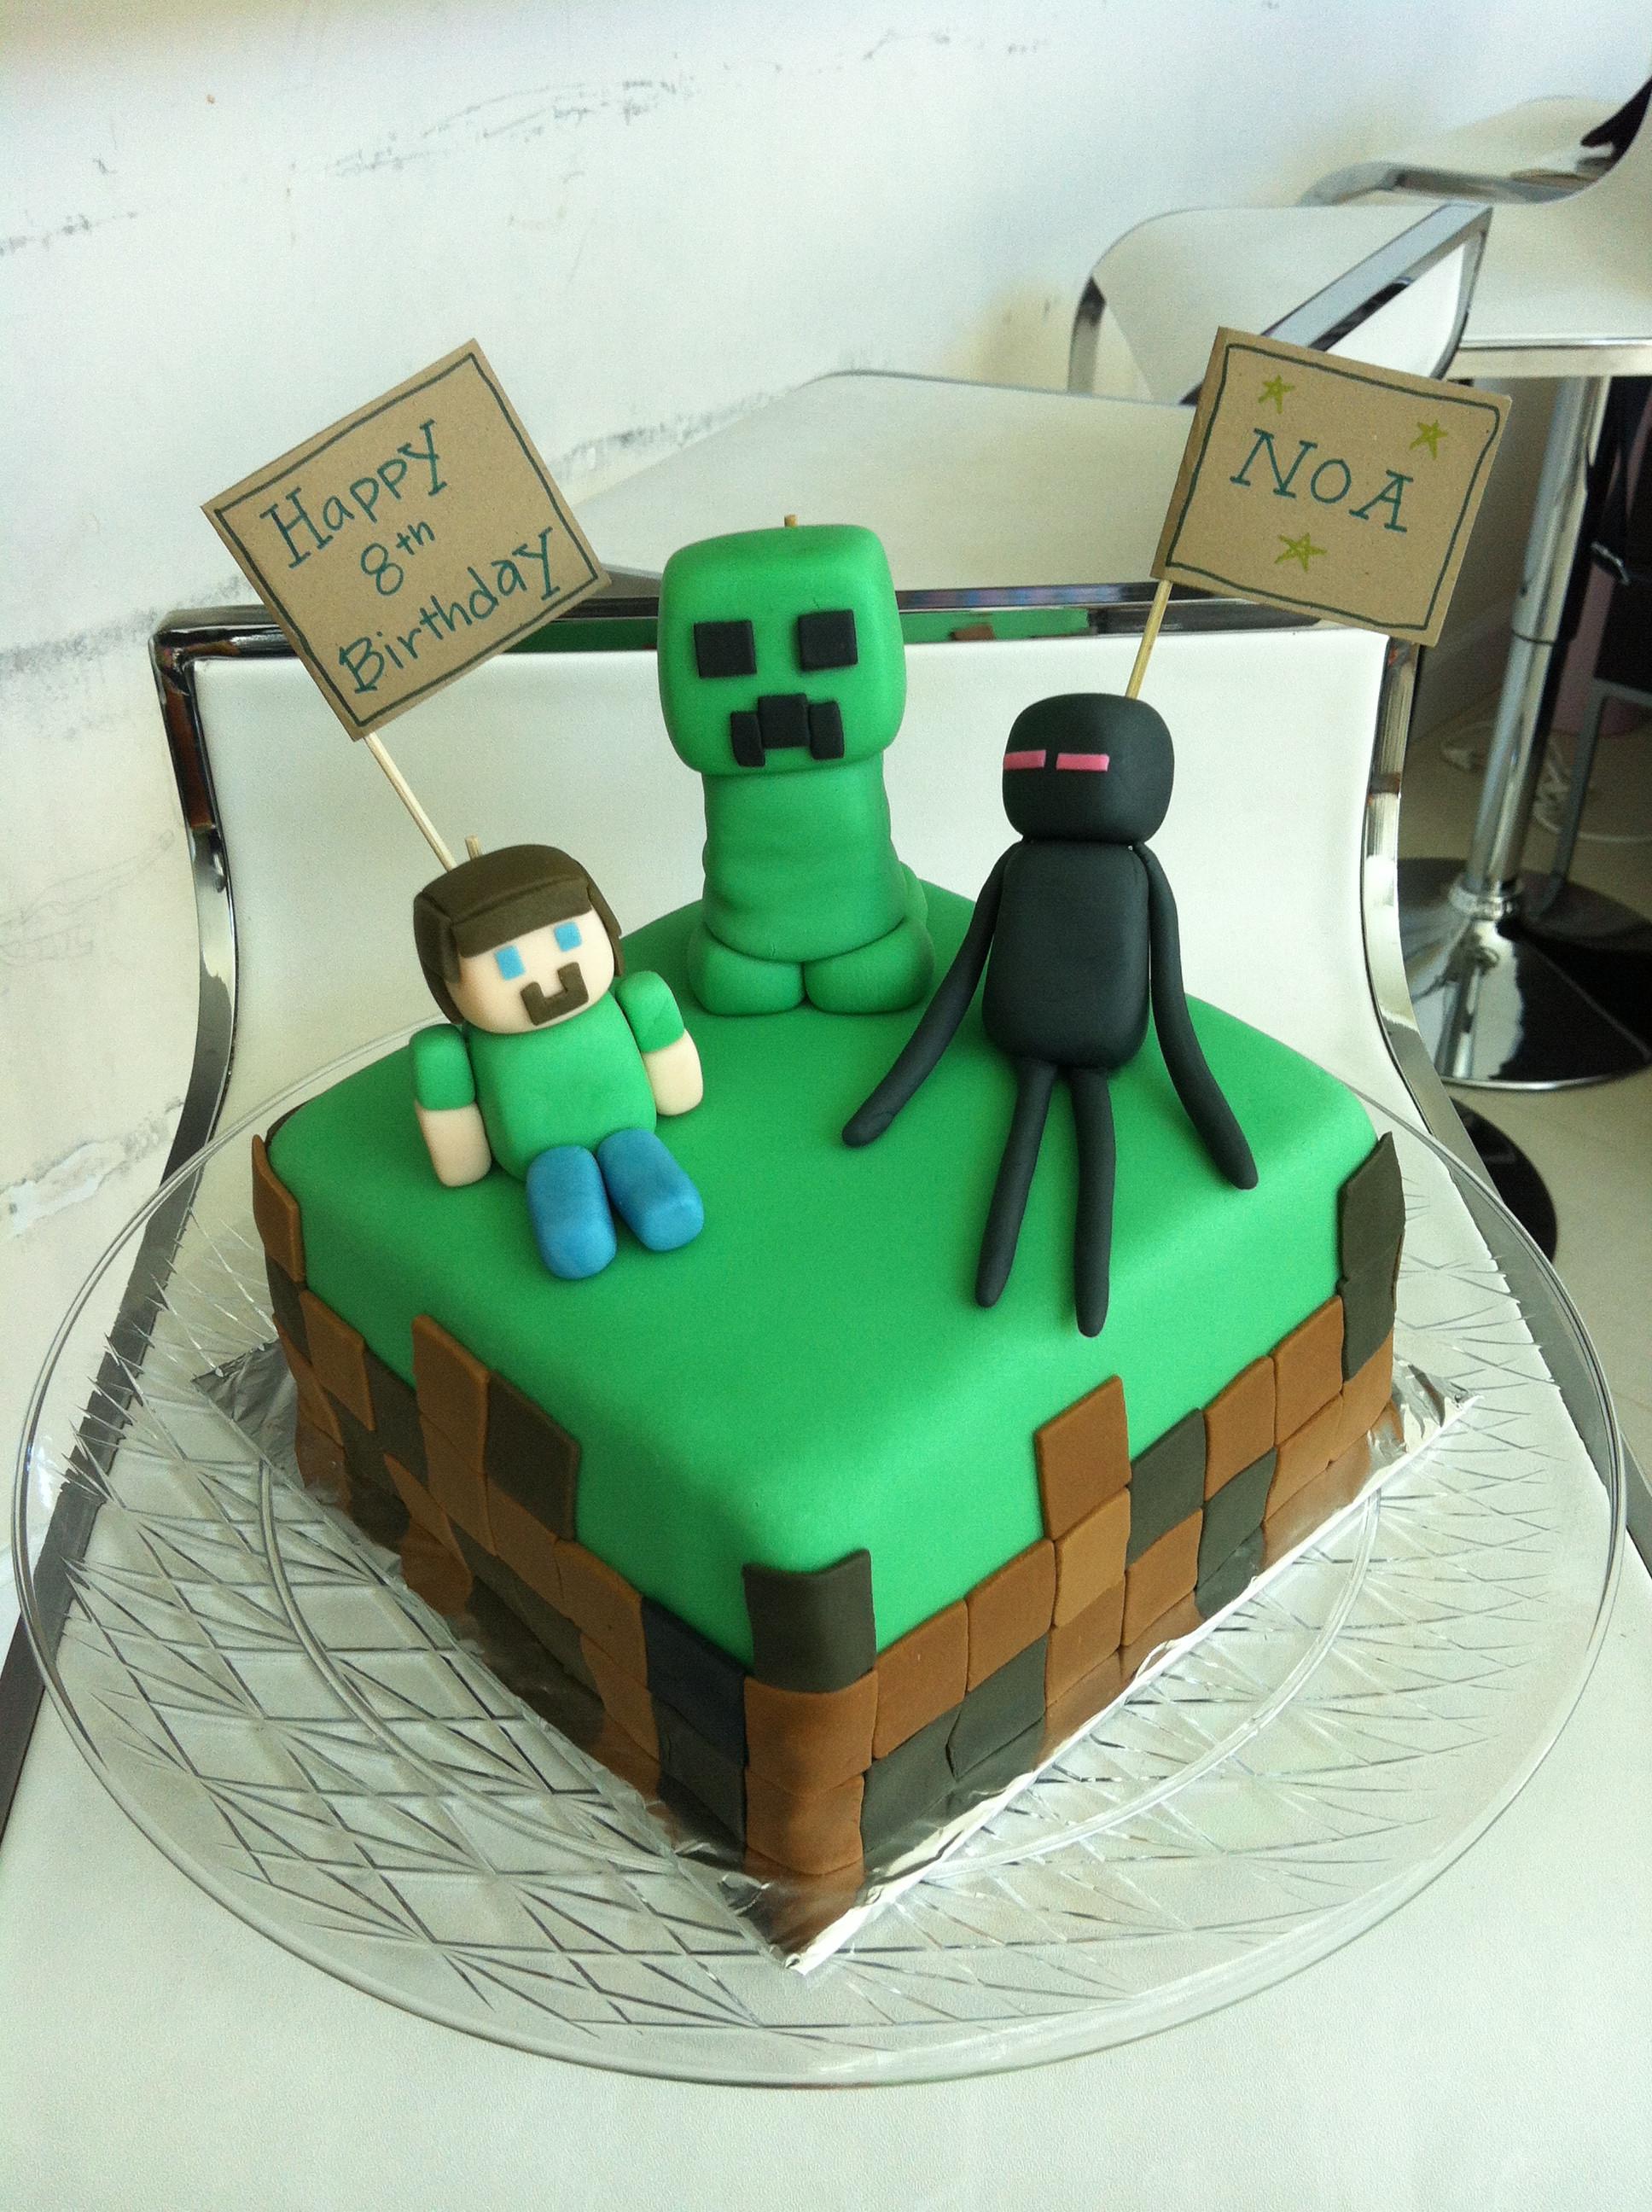 Best ideas about Minecraft Birthday Cake . Save or Pin Minecraft Cake Now.